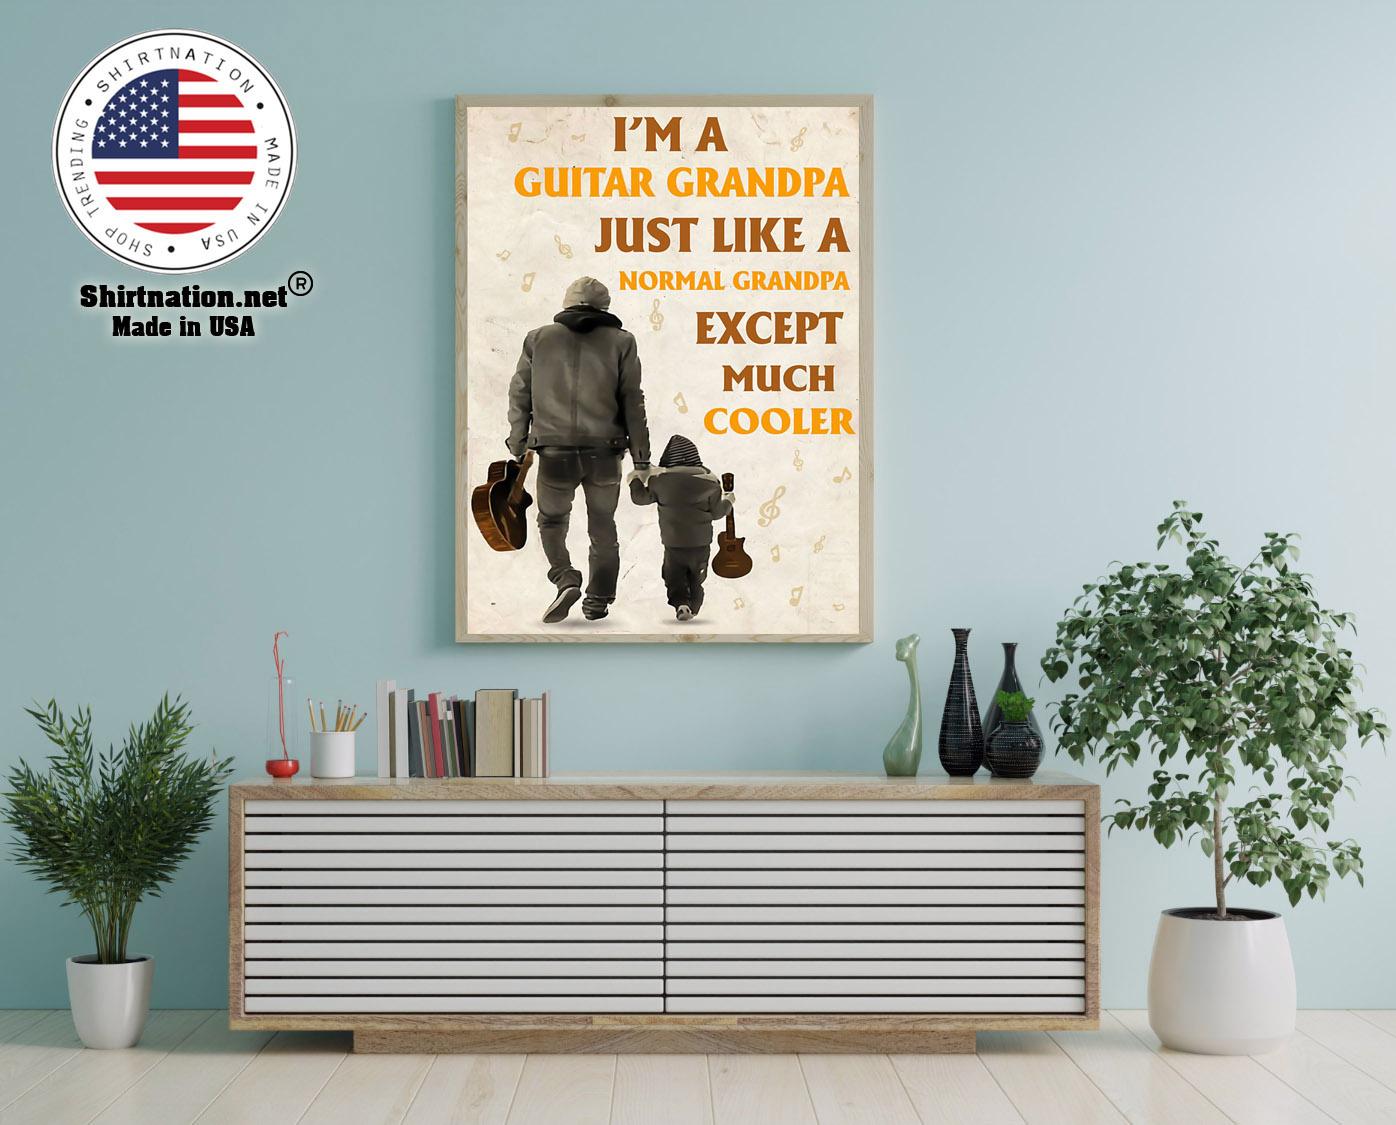 Im a guitar grandpa just like a normal grandpa except much cooler poster 12